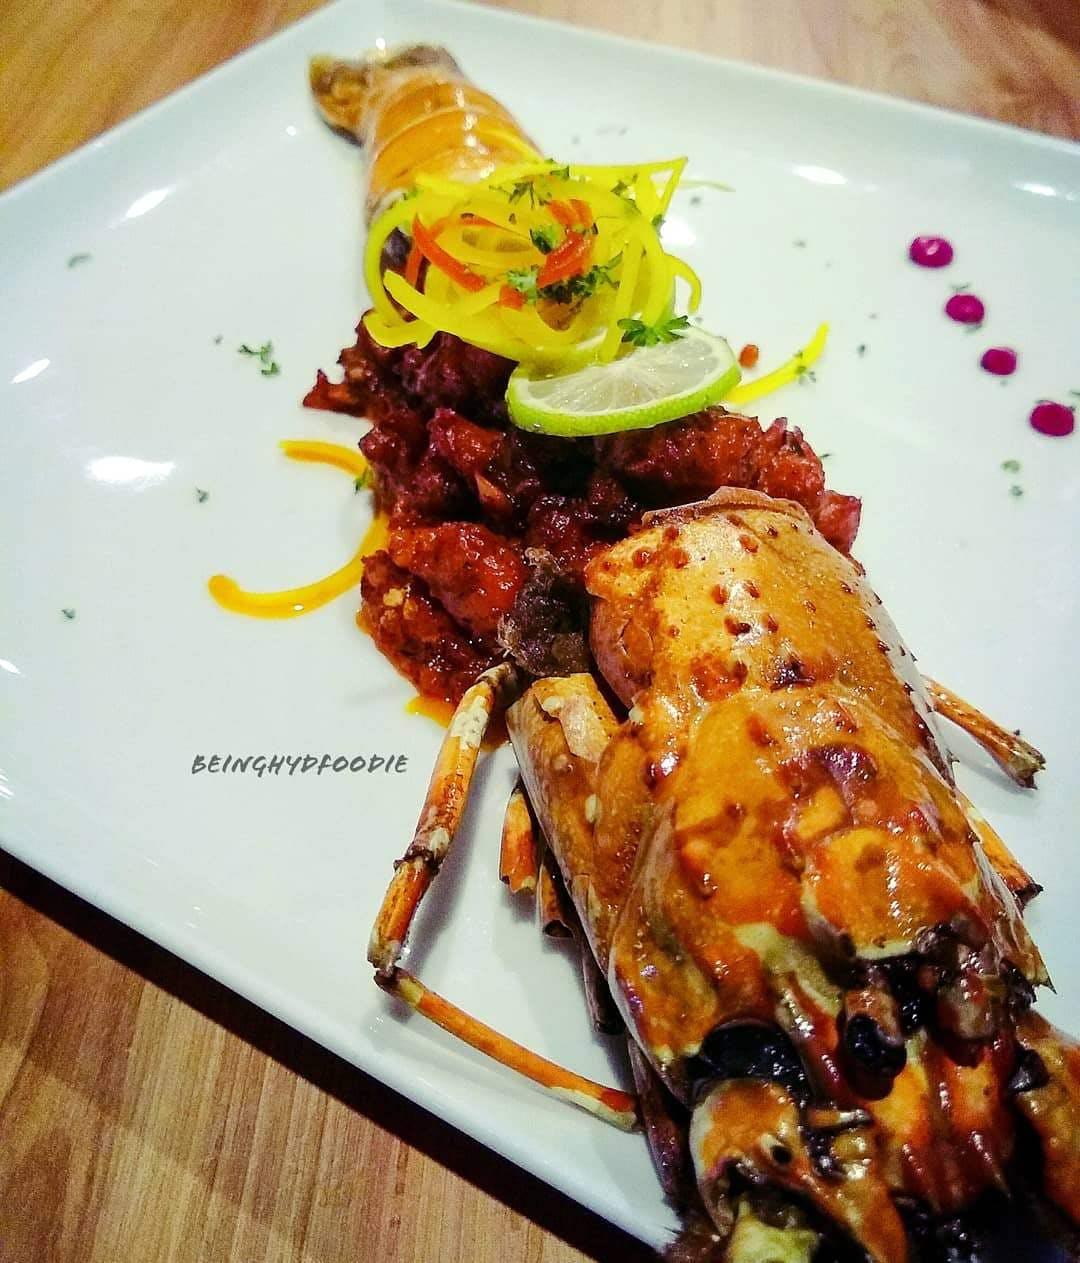 Dish,Food,Cuisine,Ingredient,Meat,Produce,Ikan bakar,À la carte food,Recipe,Thai food